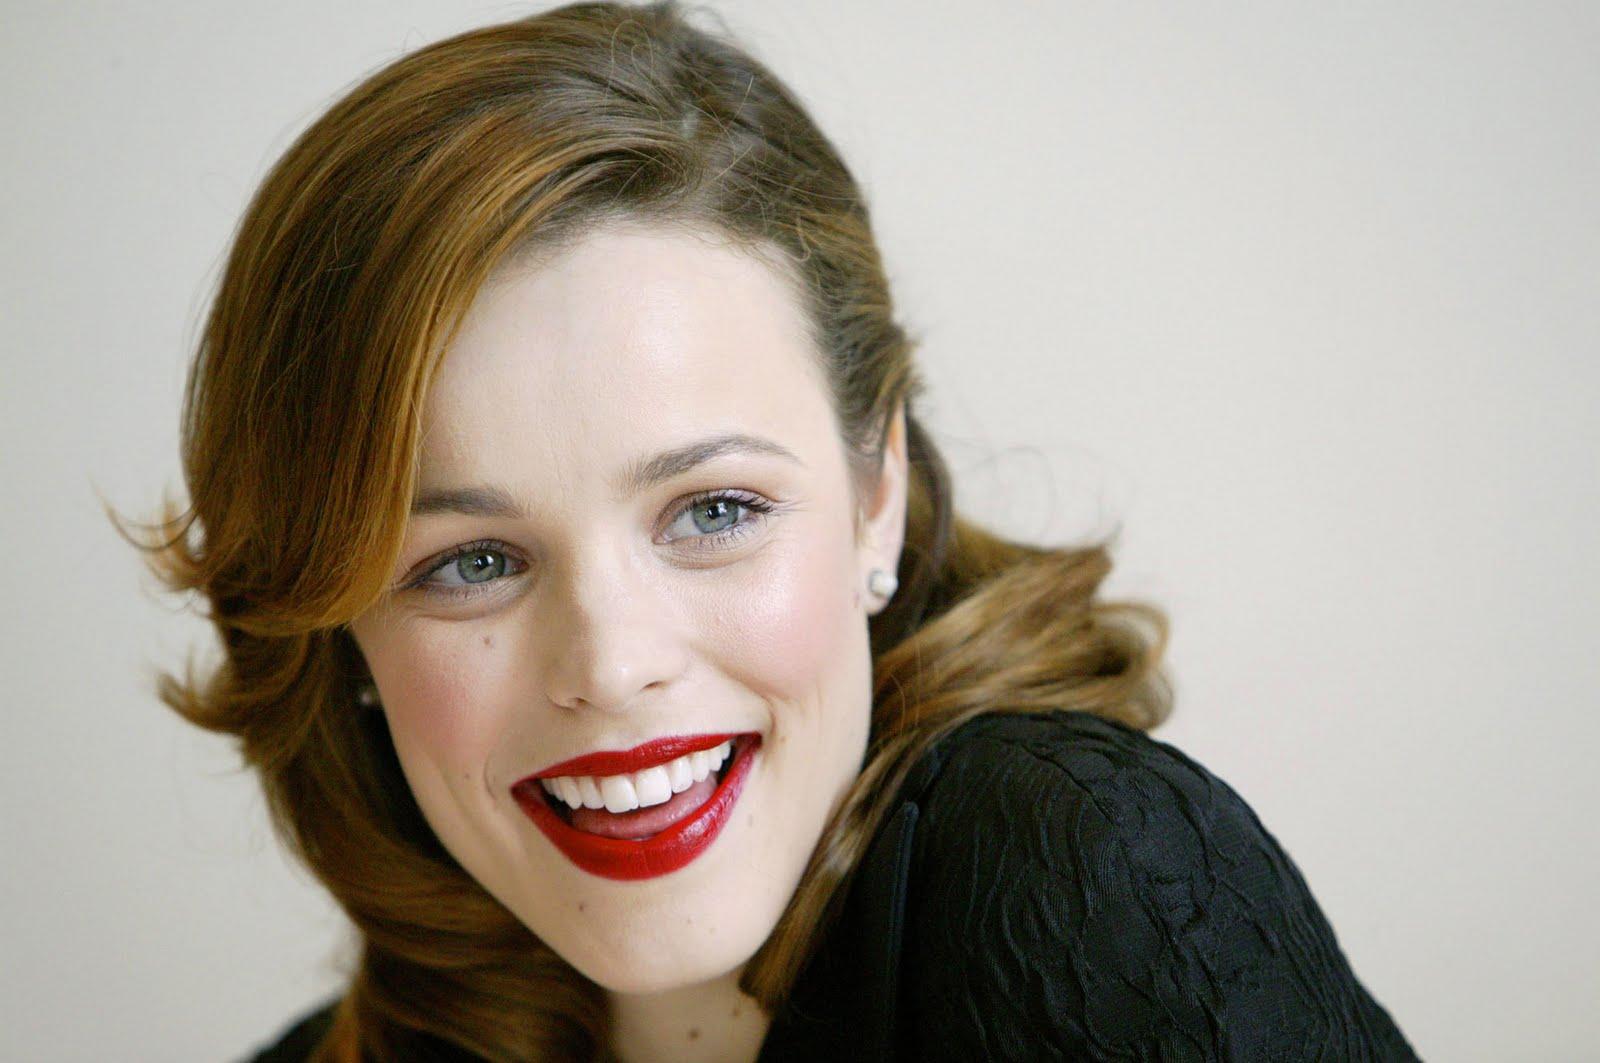 http://1.bp.blogspot.com/-RHrBQUvLQVQ/TelXUwsyJSI/AAAAAAAAAKI/BwJRGrcuSdY/s1600/Rachel+McAdams+%25282%2529.jpg